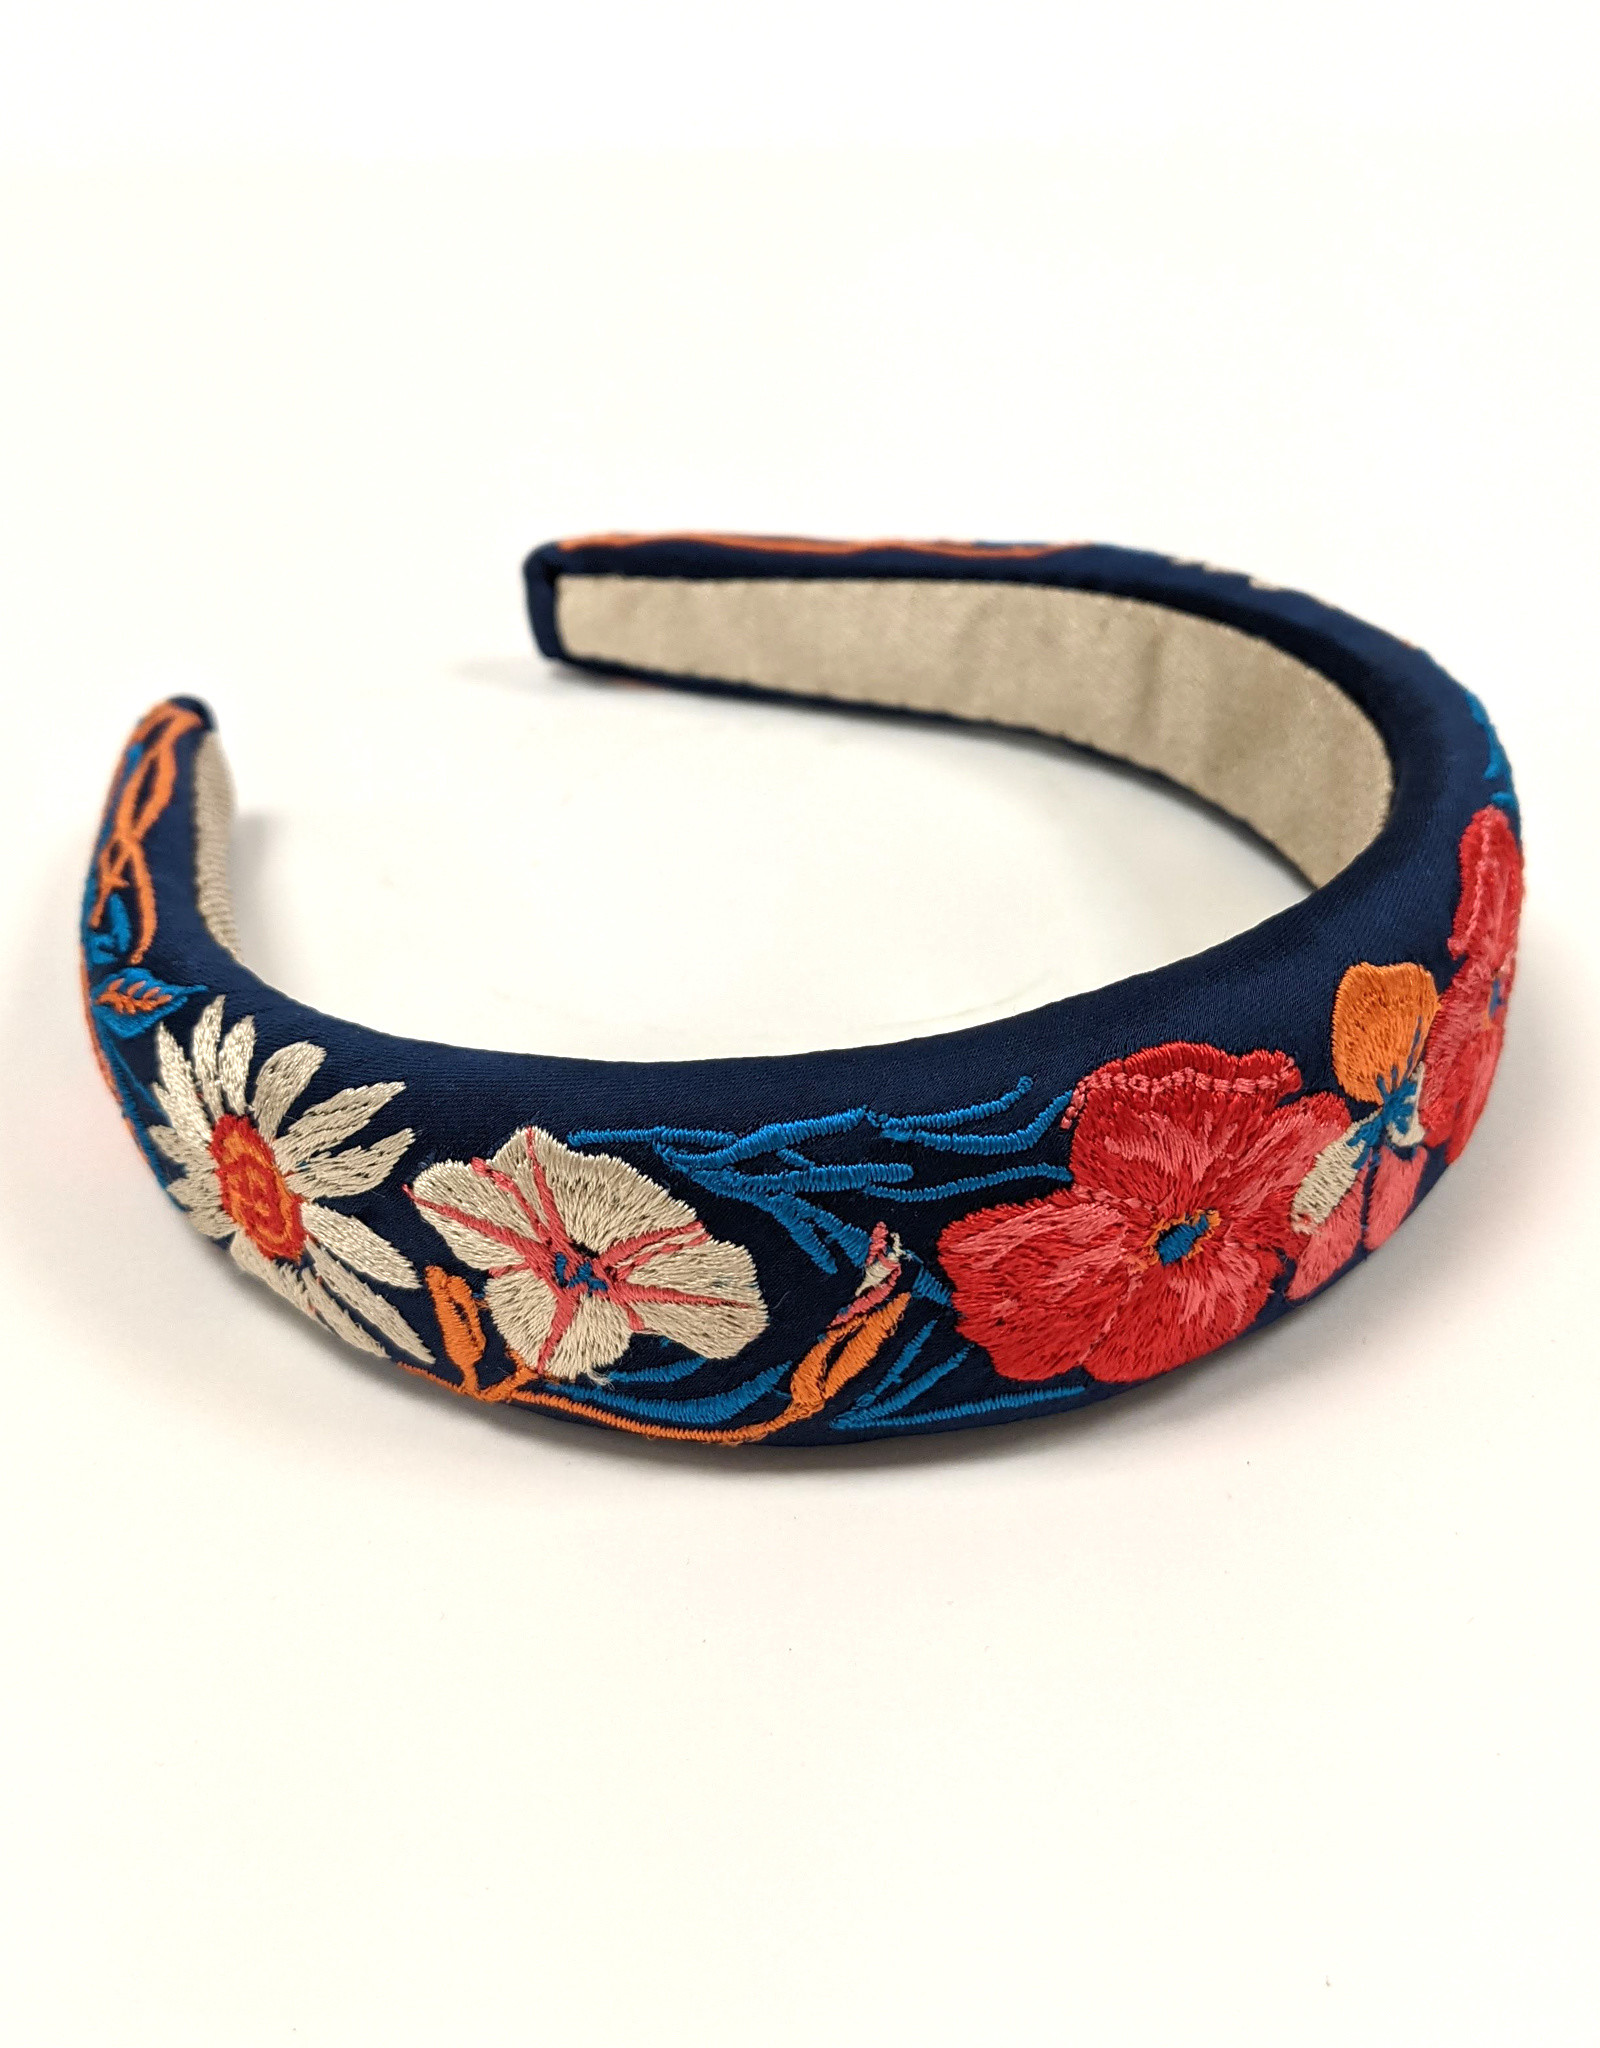 Country Garden Navy Padded Headband